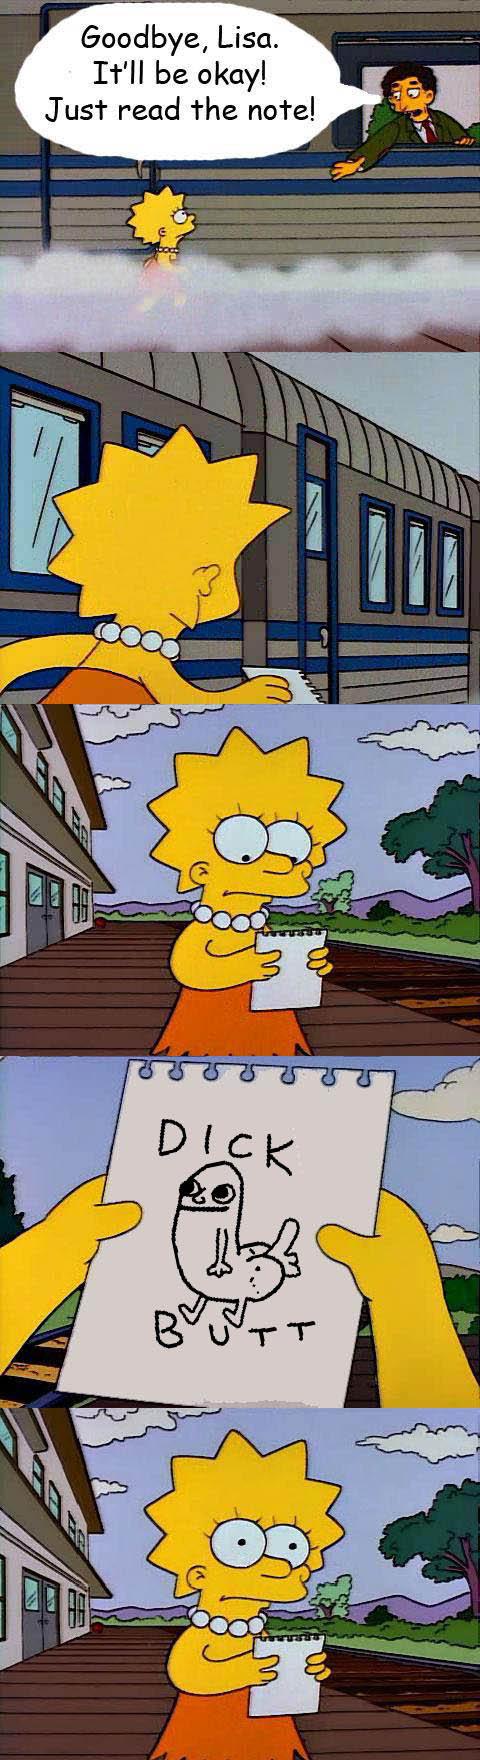 troll'd. Lisa got troll'd. Goodbye, Lisa. ll be okay! Just read the note!. theres a kid at my school called richard butt so we call him dick butt :D troll dickbut